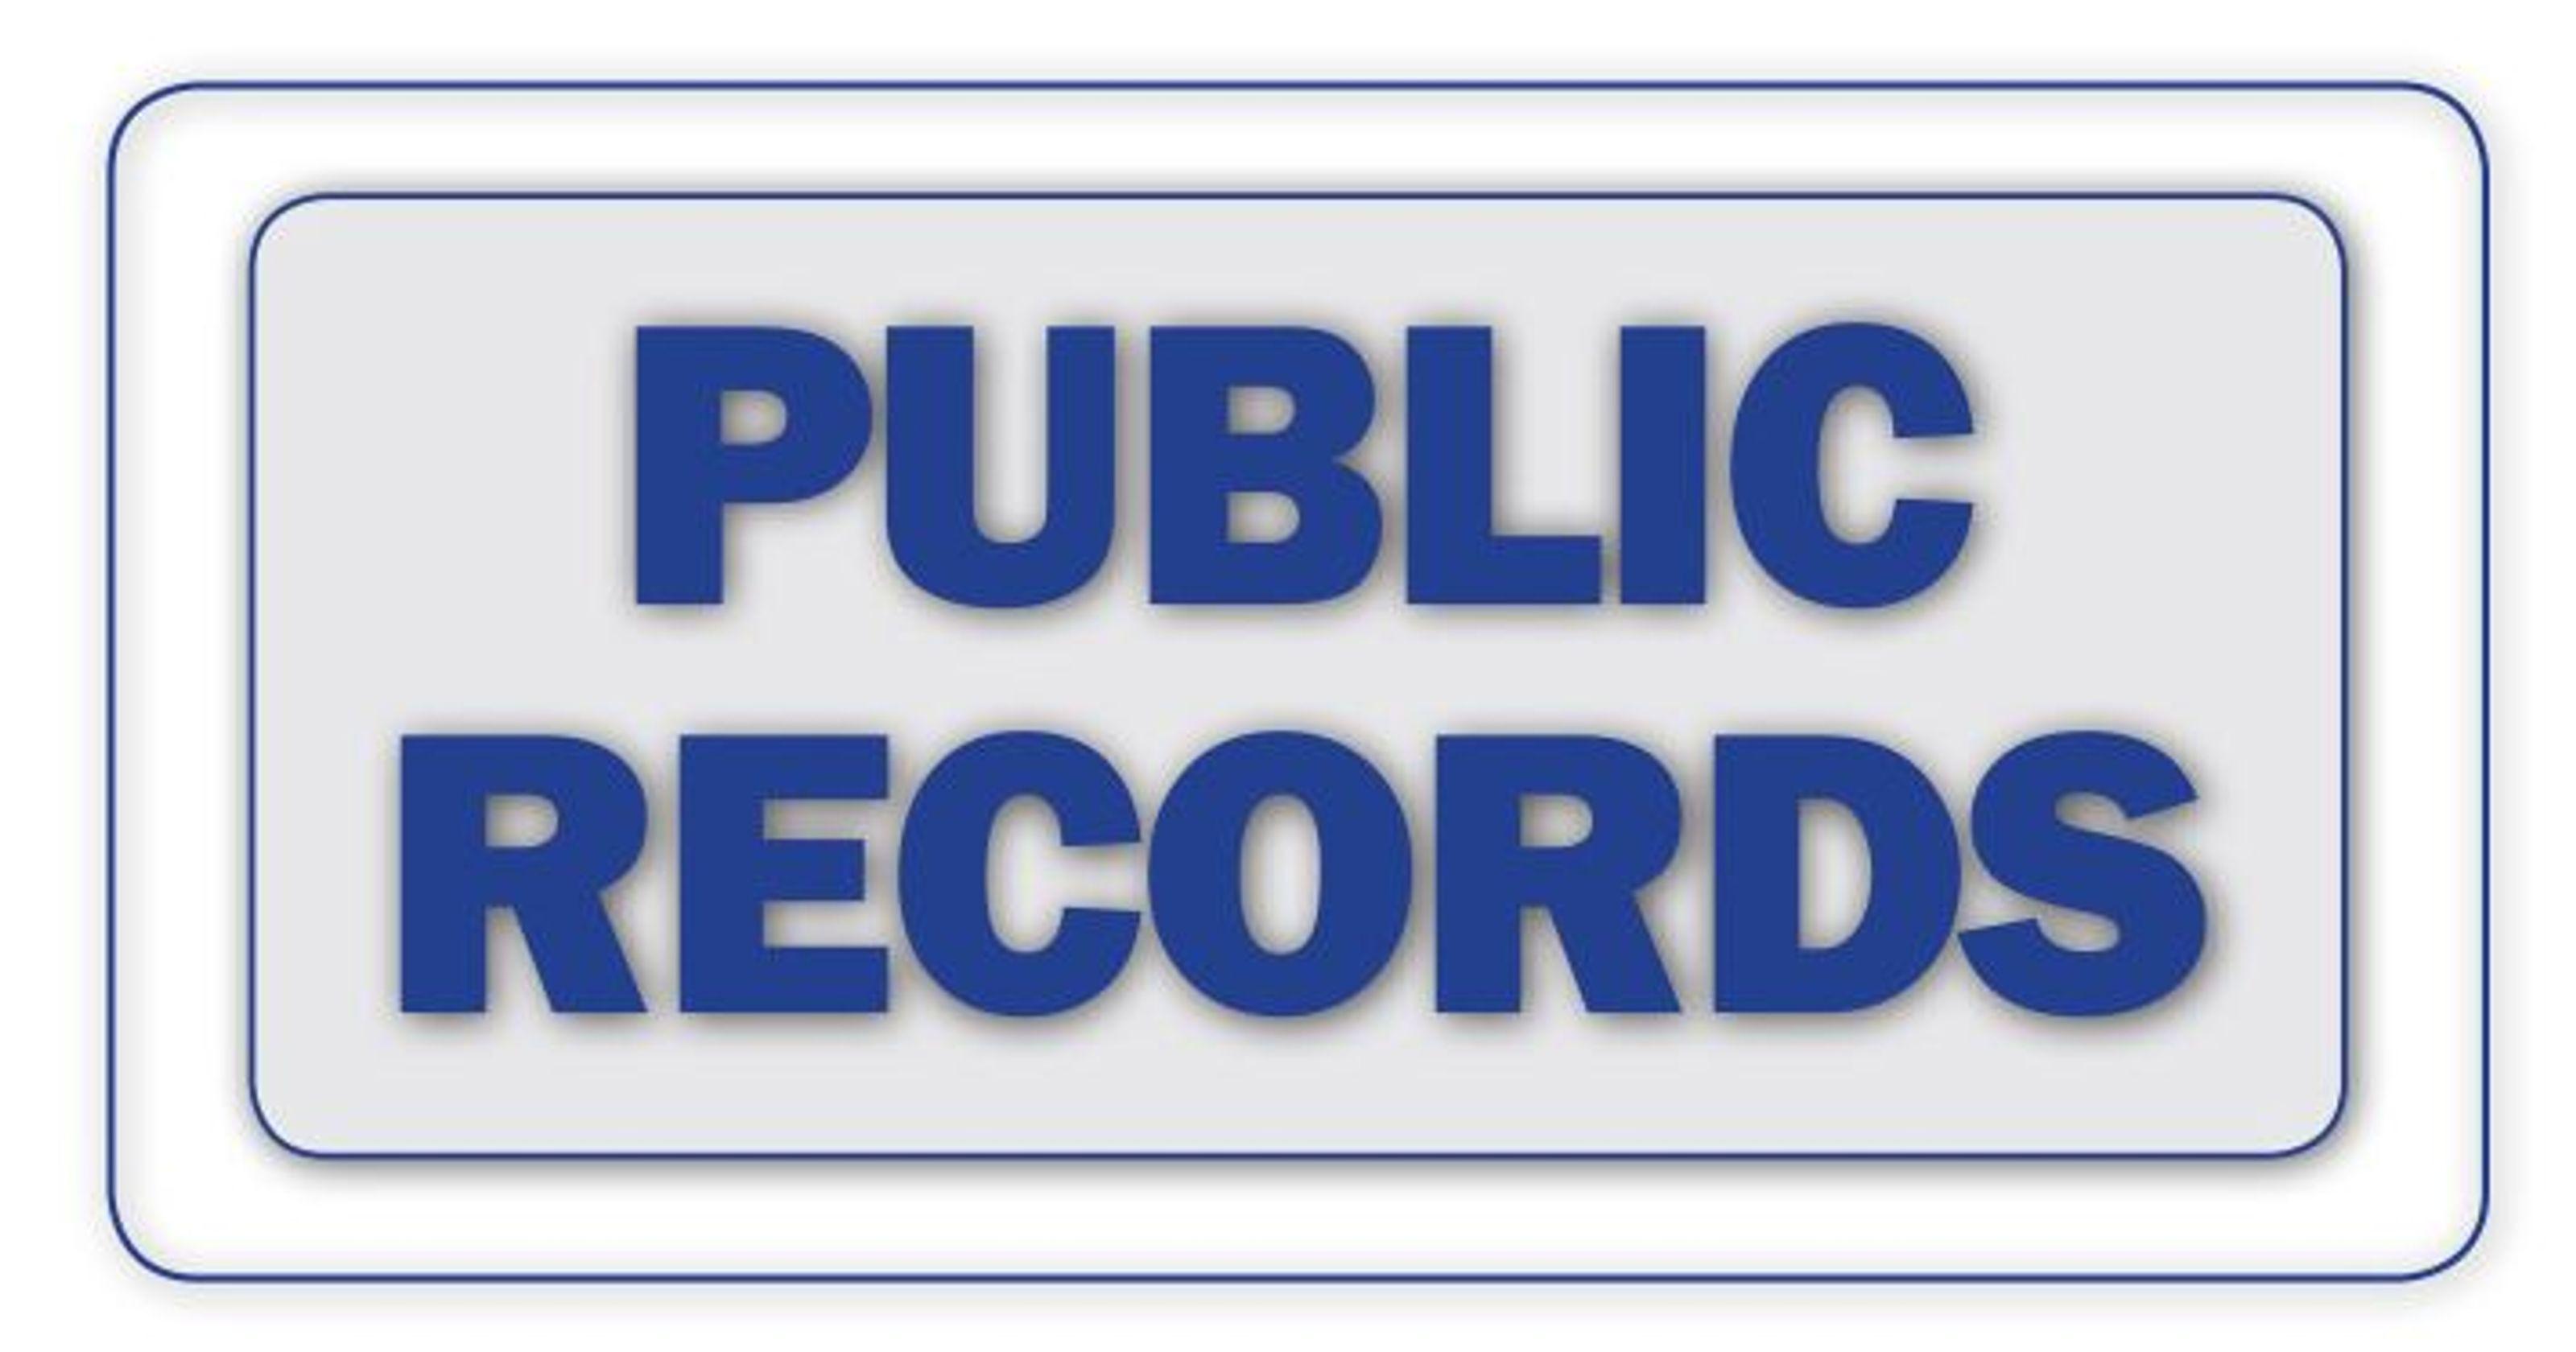 24 Popular Pc Hardwood Floors Ramsey 2021 free download pc hardwood floors ramsey of public records may pertaining to 636283699612602783 public records